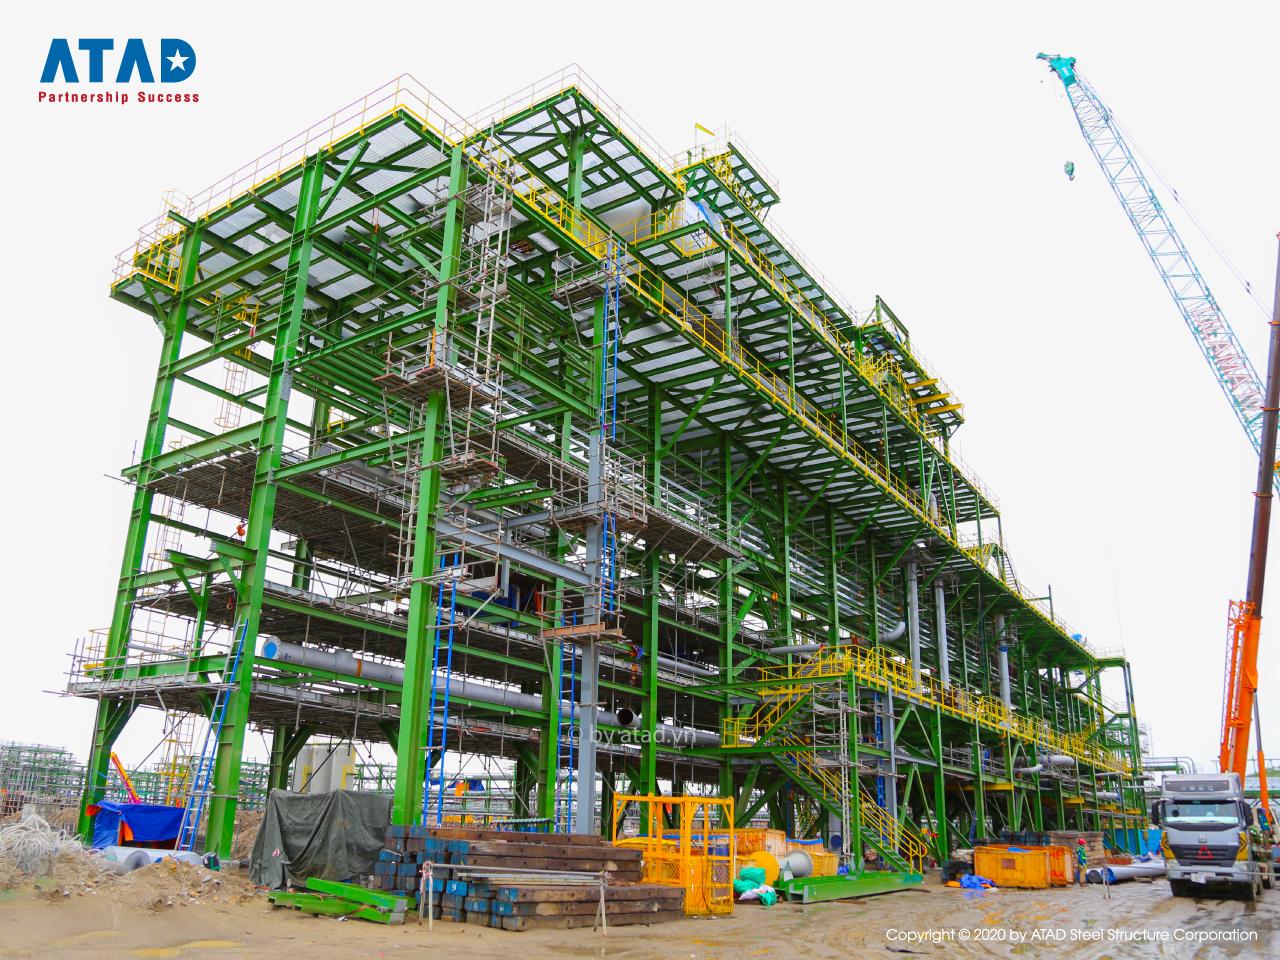 ATAD implemented Long Son Petrochemicals Complex, Ba Ria - Vung Tau